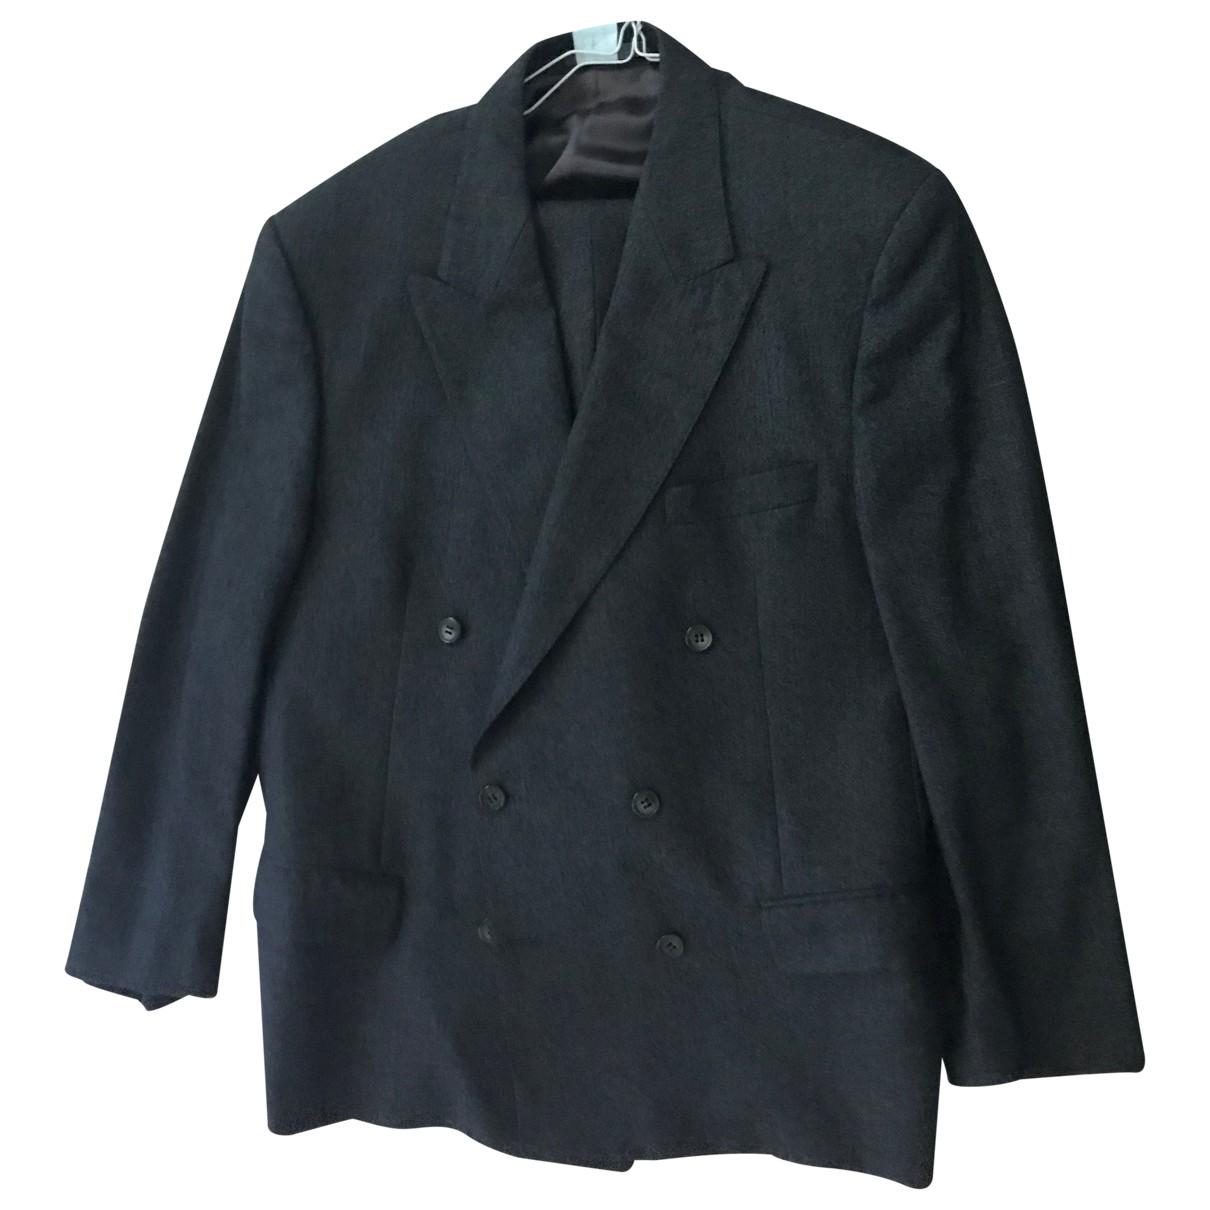 Yves Saint Laurent N Wool Suits for Men 56 FR